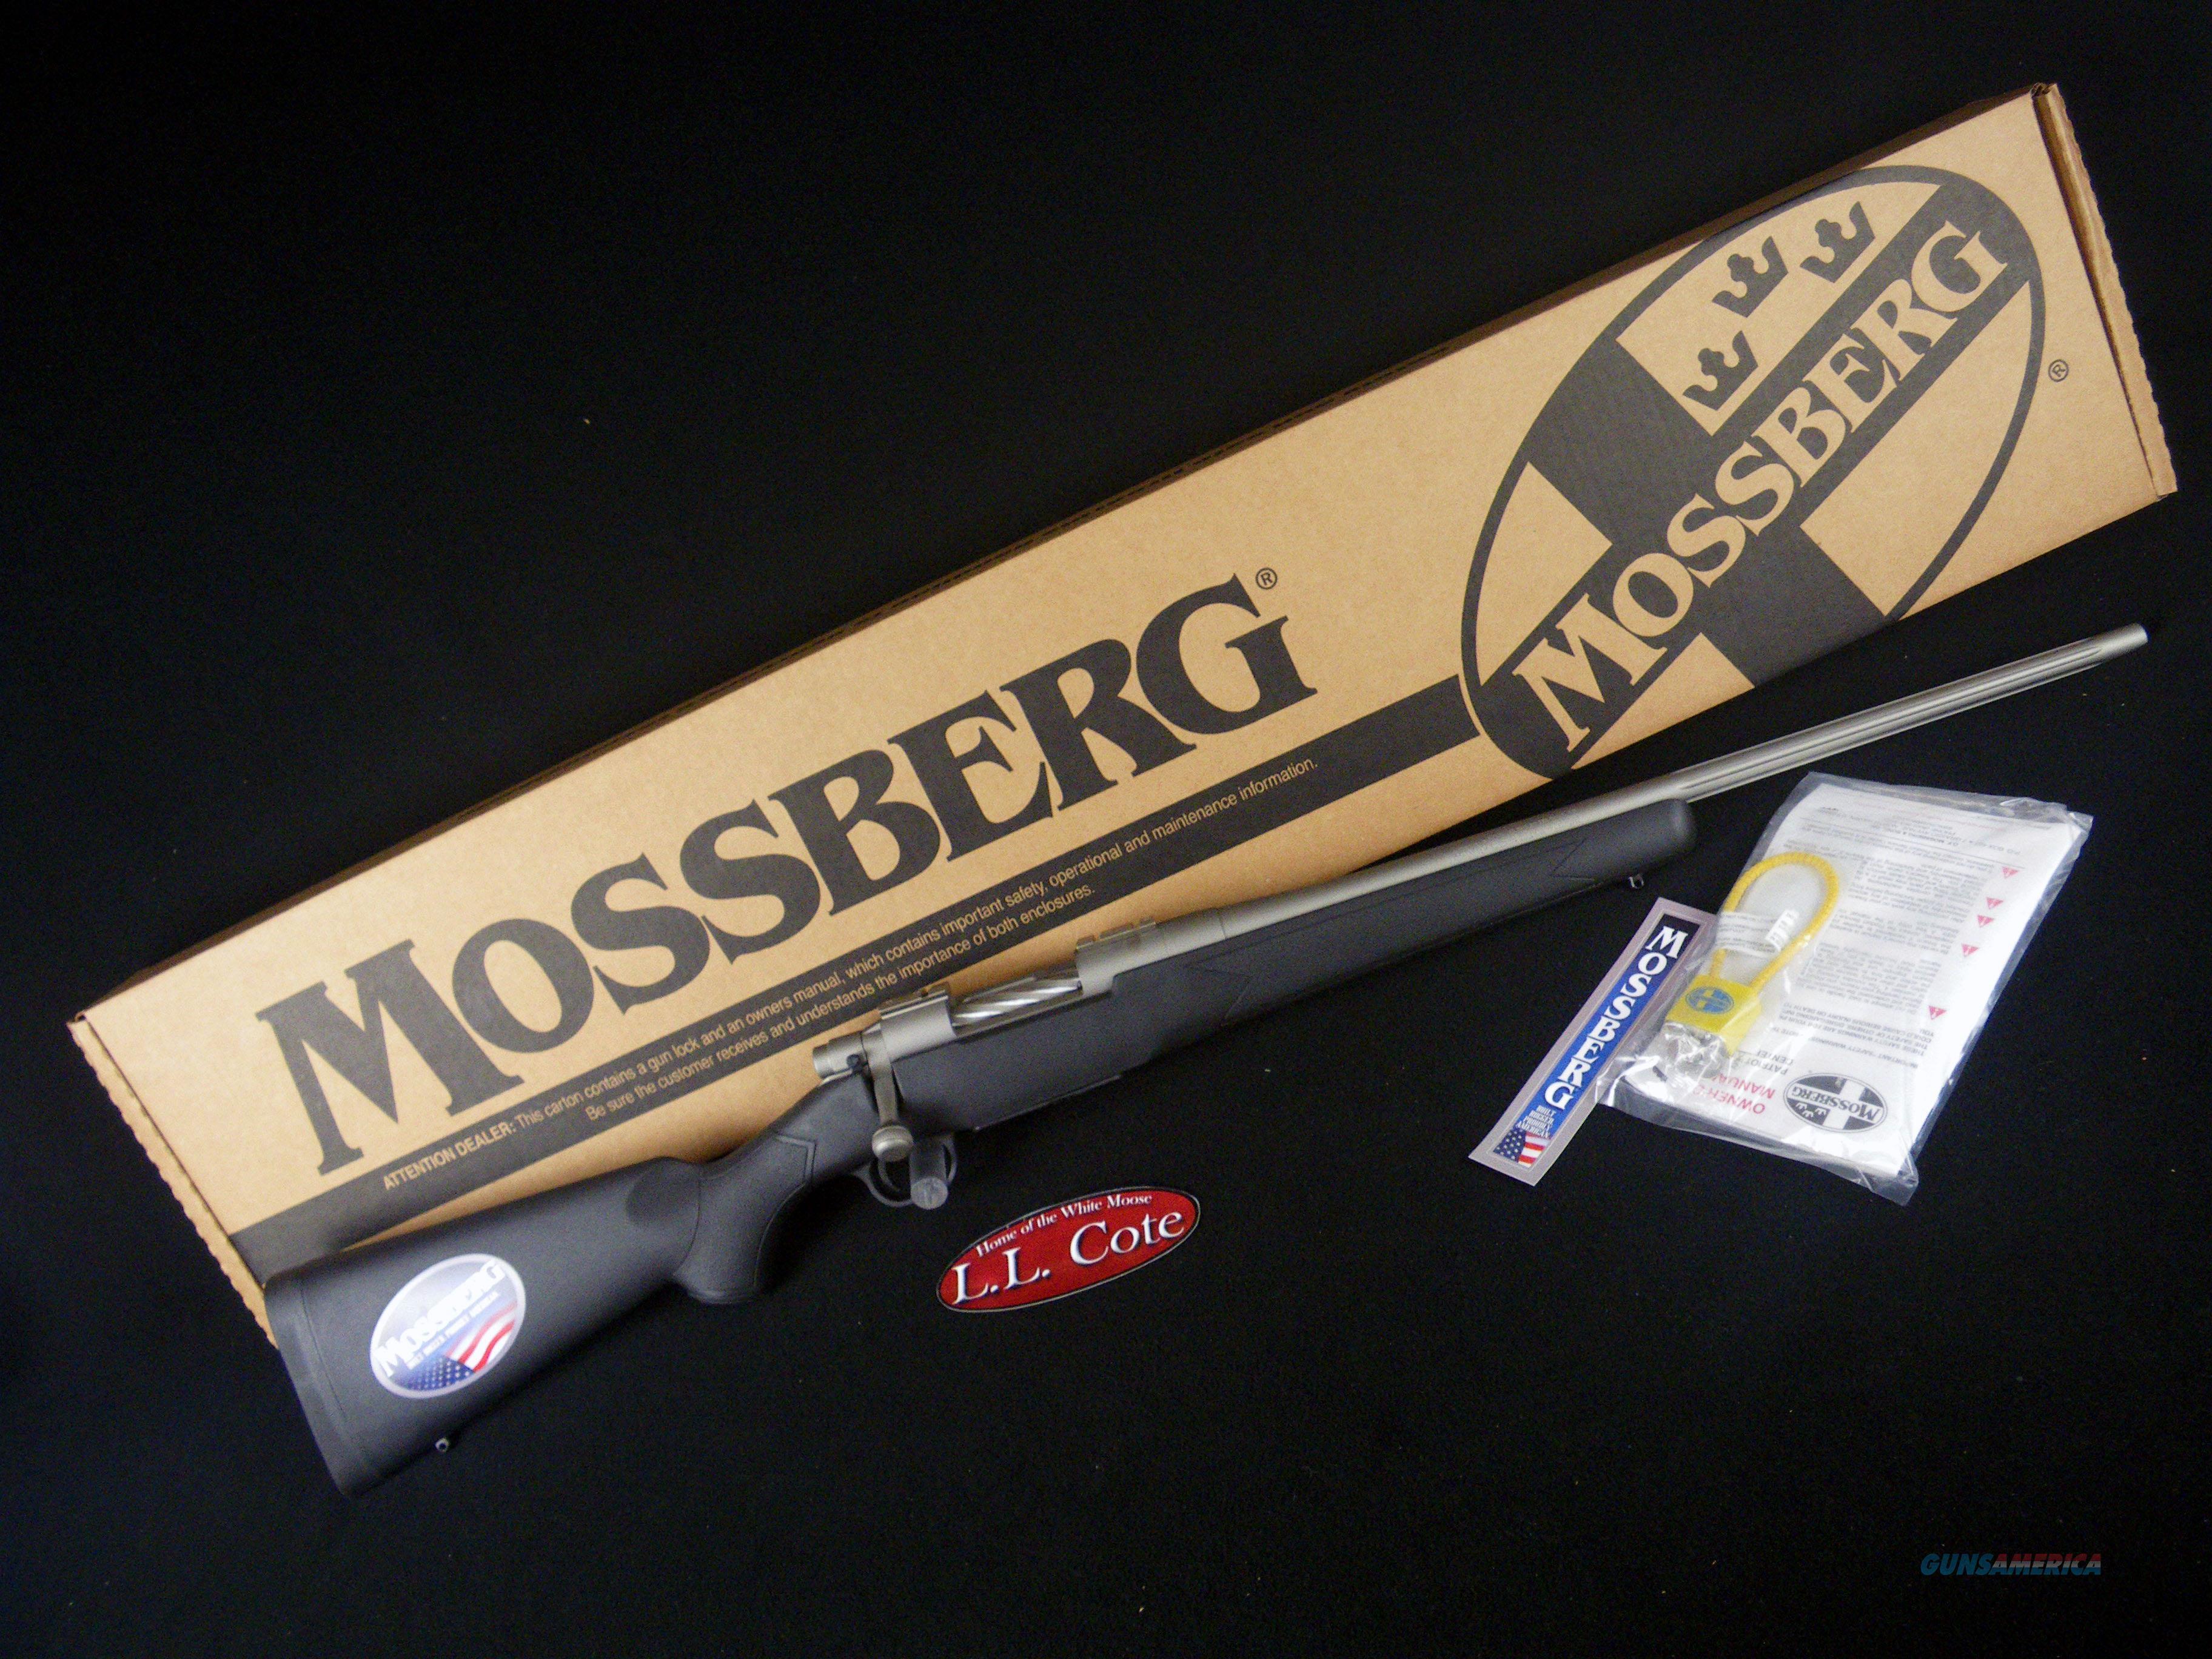 "Mossberg Patriot Cerakote 30-06 Sprg 22"" NEW 28010  Guns > Rifles > Mossberg Rifles > Patriot"